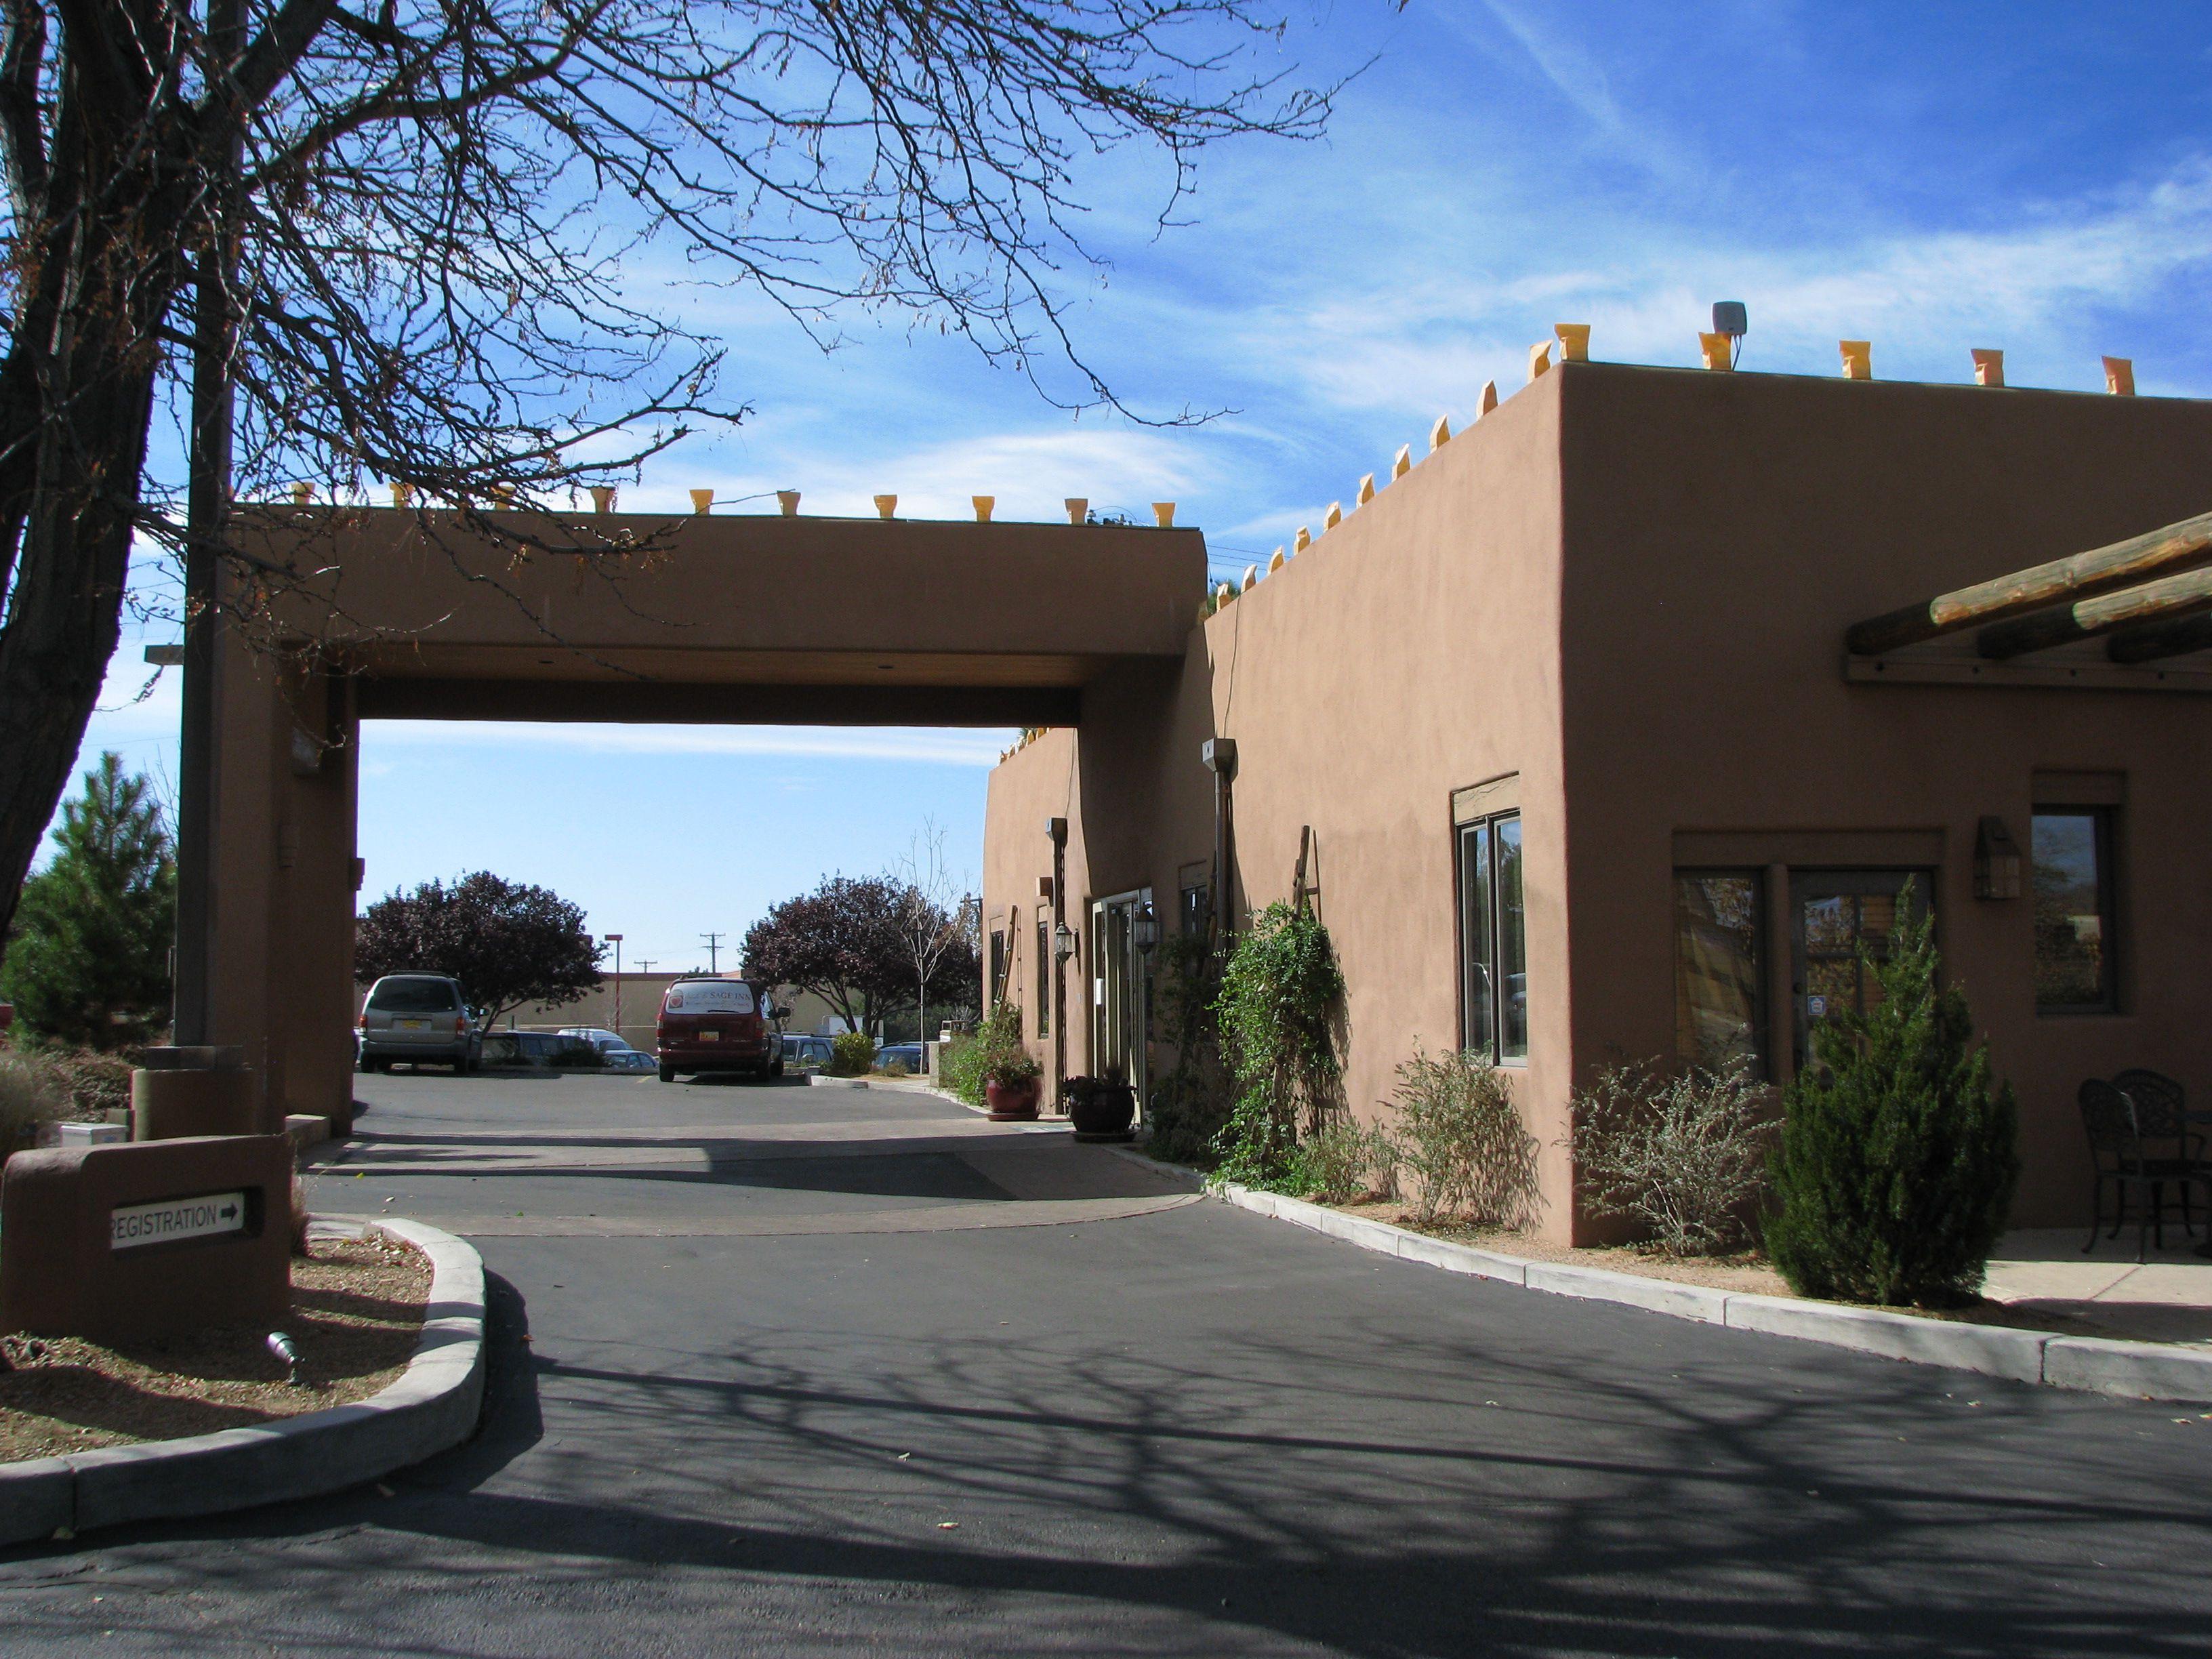 Santa Fe Gay Hotels And Inns Guide